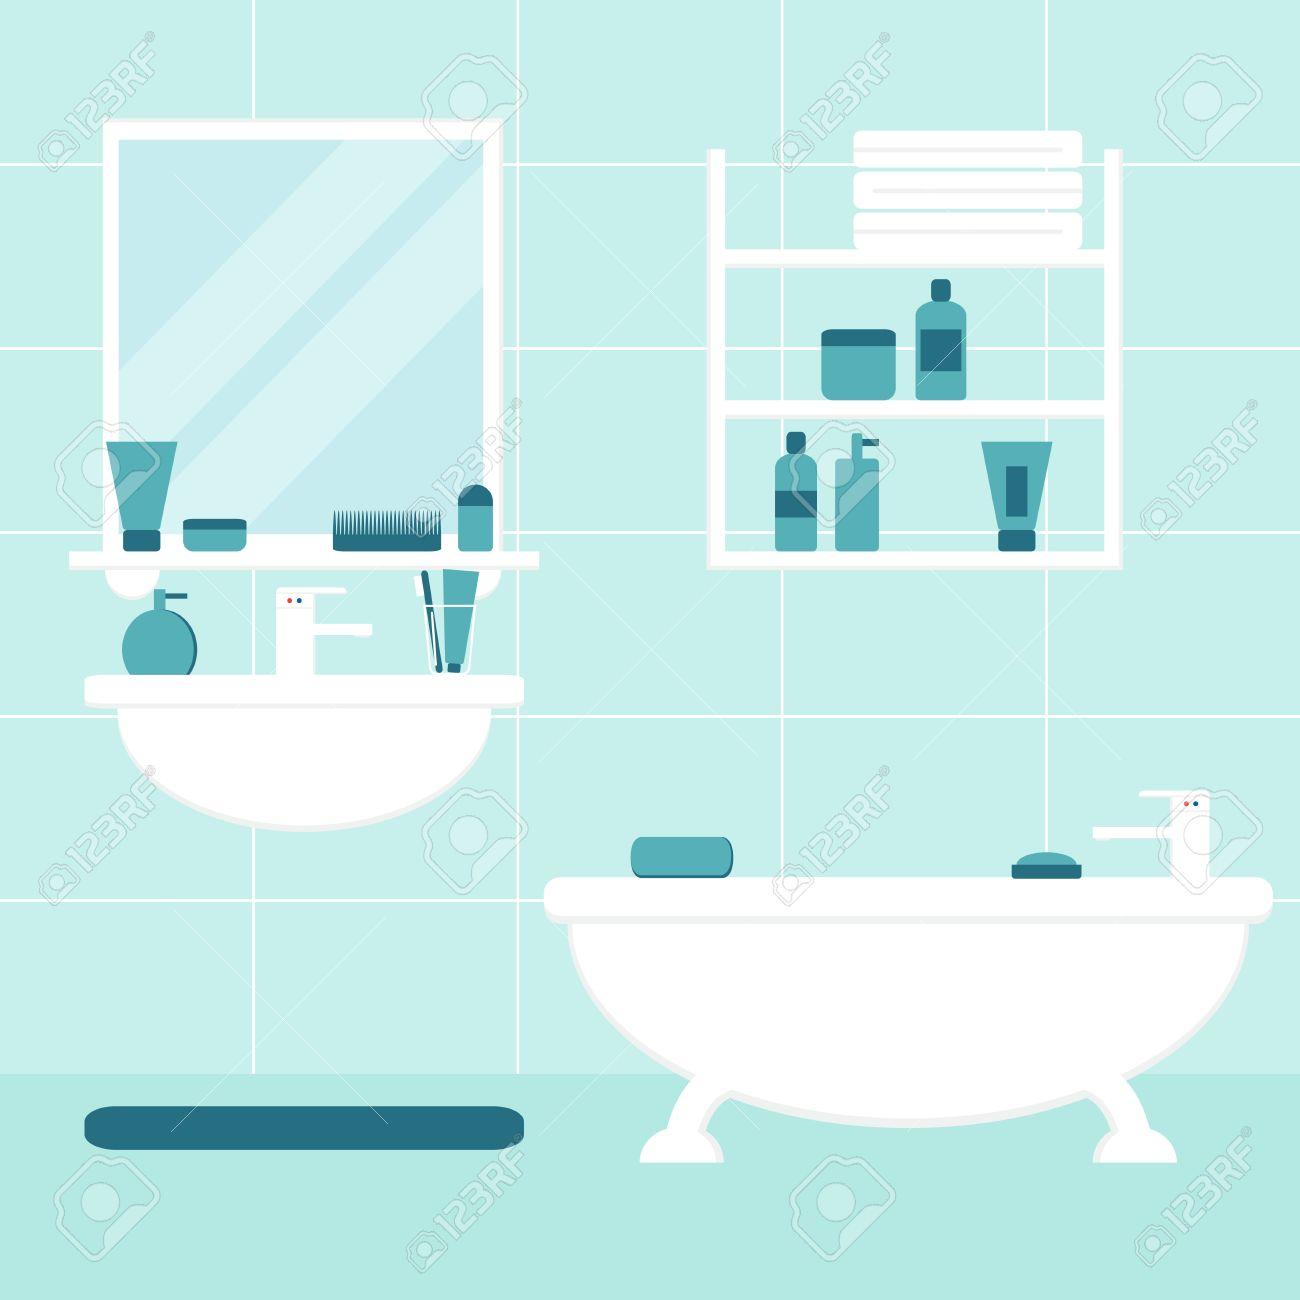 salle de bain bathroom interior meubles de salle isolee sur fond baignoire lavabo miroir etagere meubles de salle de bains avec des elements de